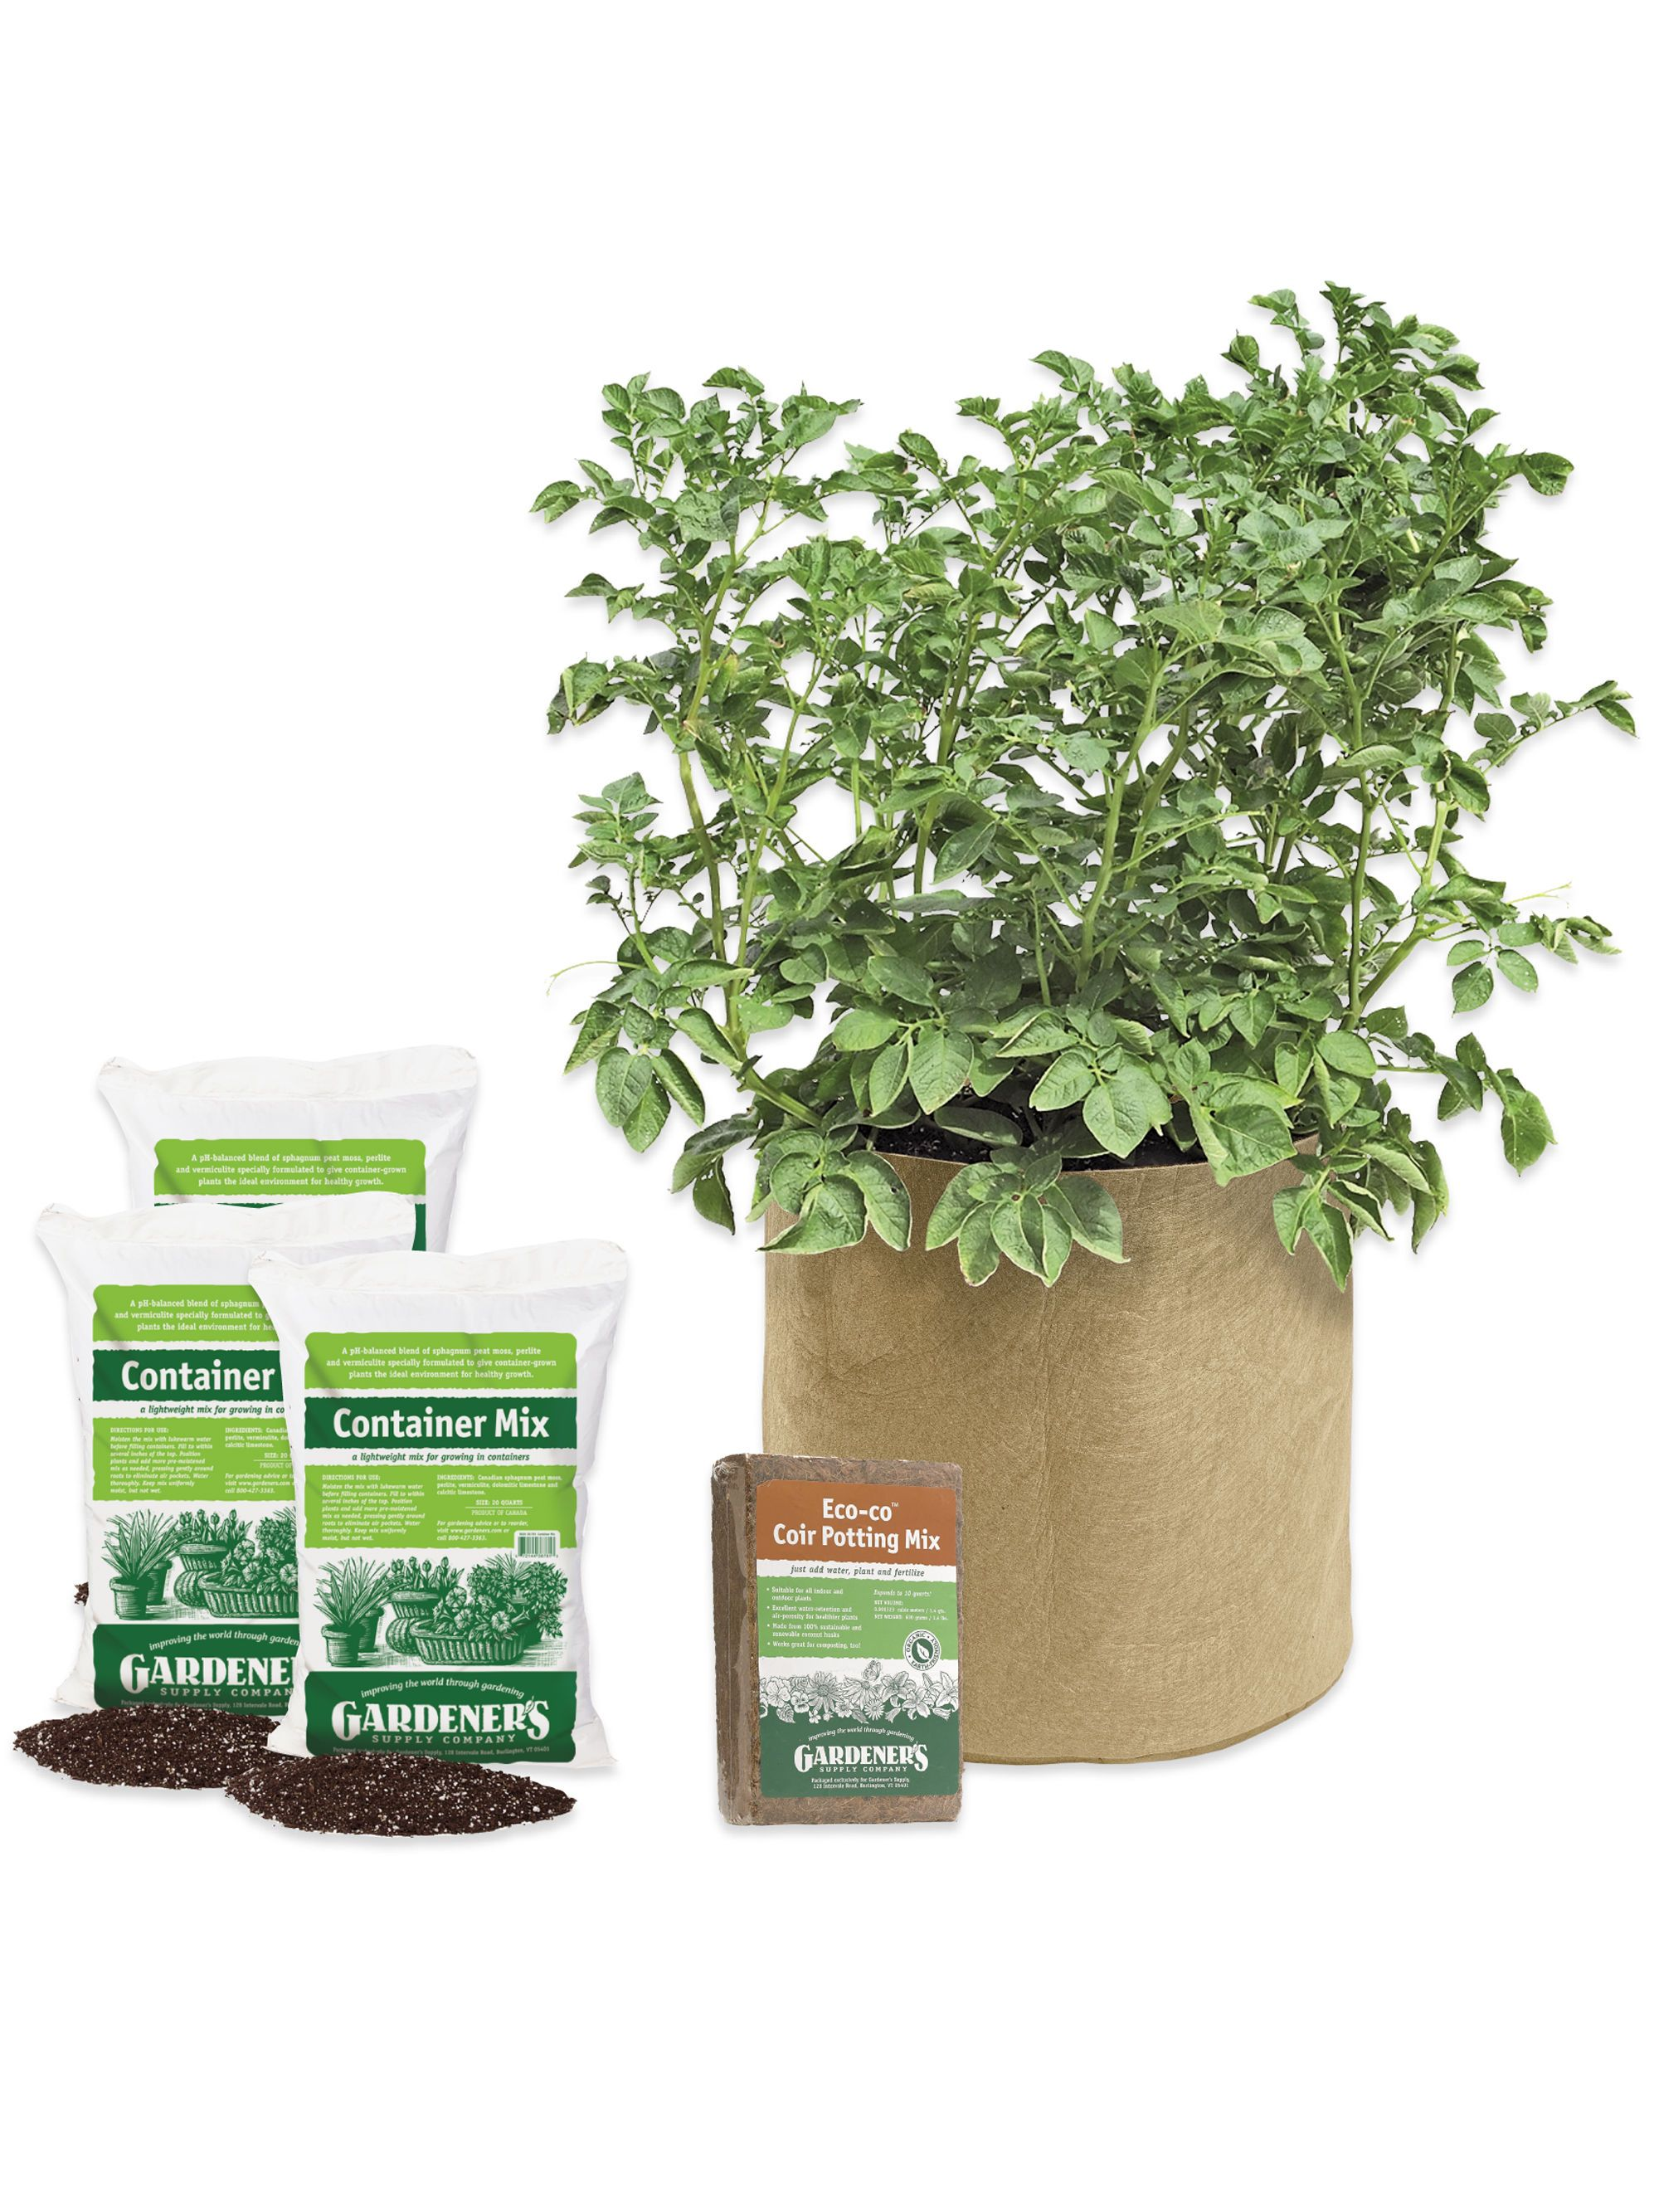 Potato Success Kit Grow Bag and Supplies for Growing